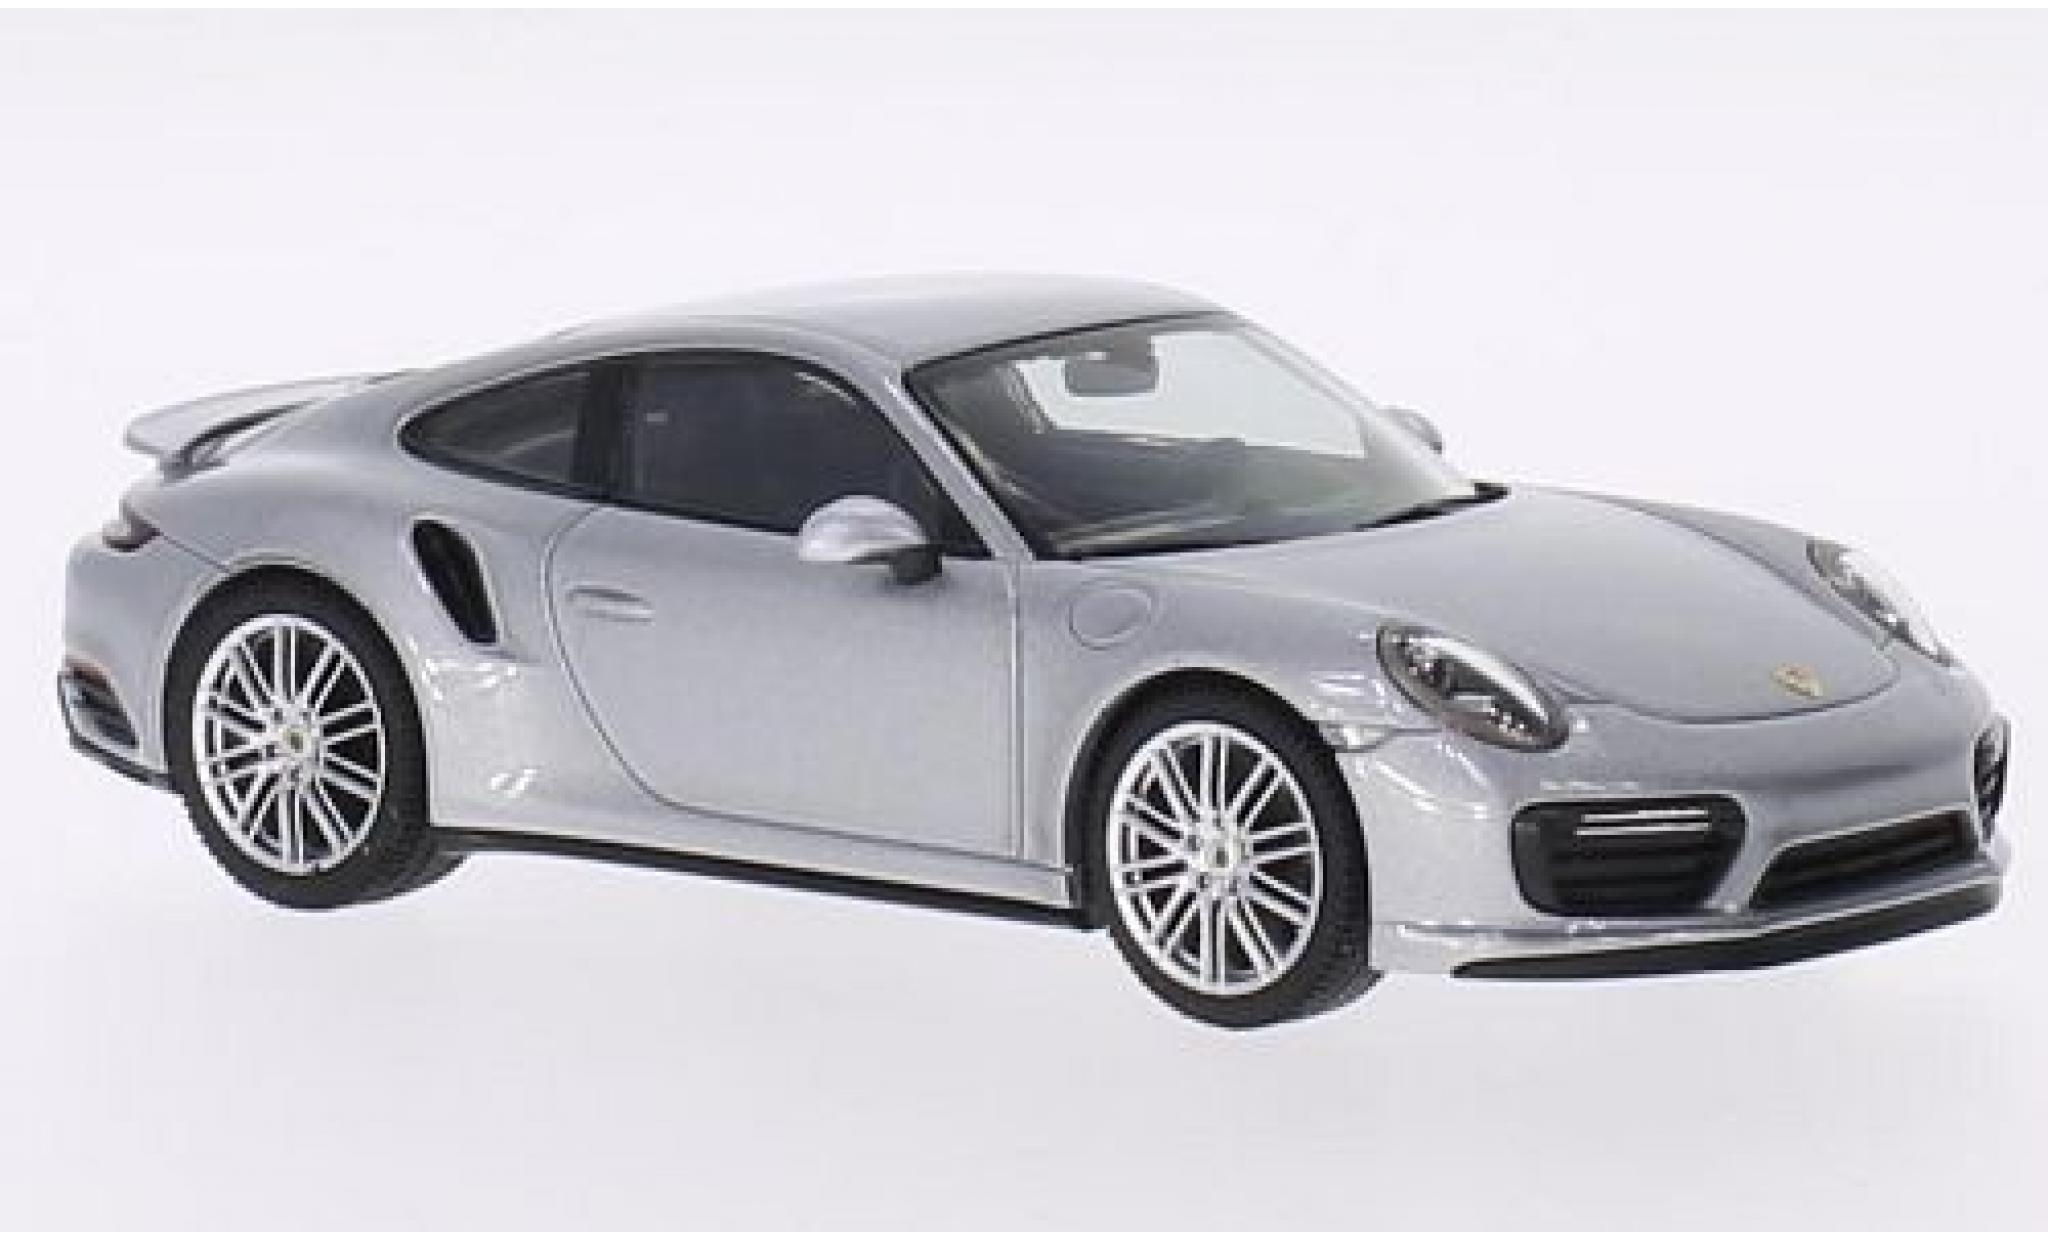 Porsche 991 Turbo 1/43 I Herpa 911 (/2) Coupe grey